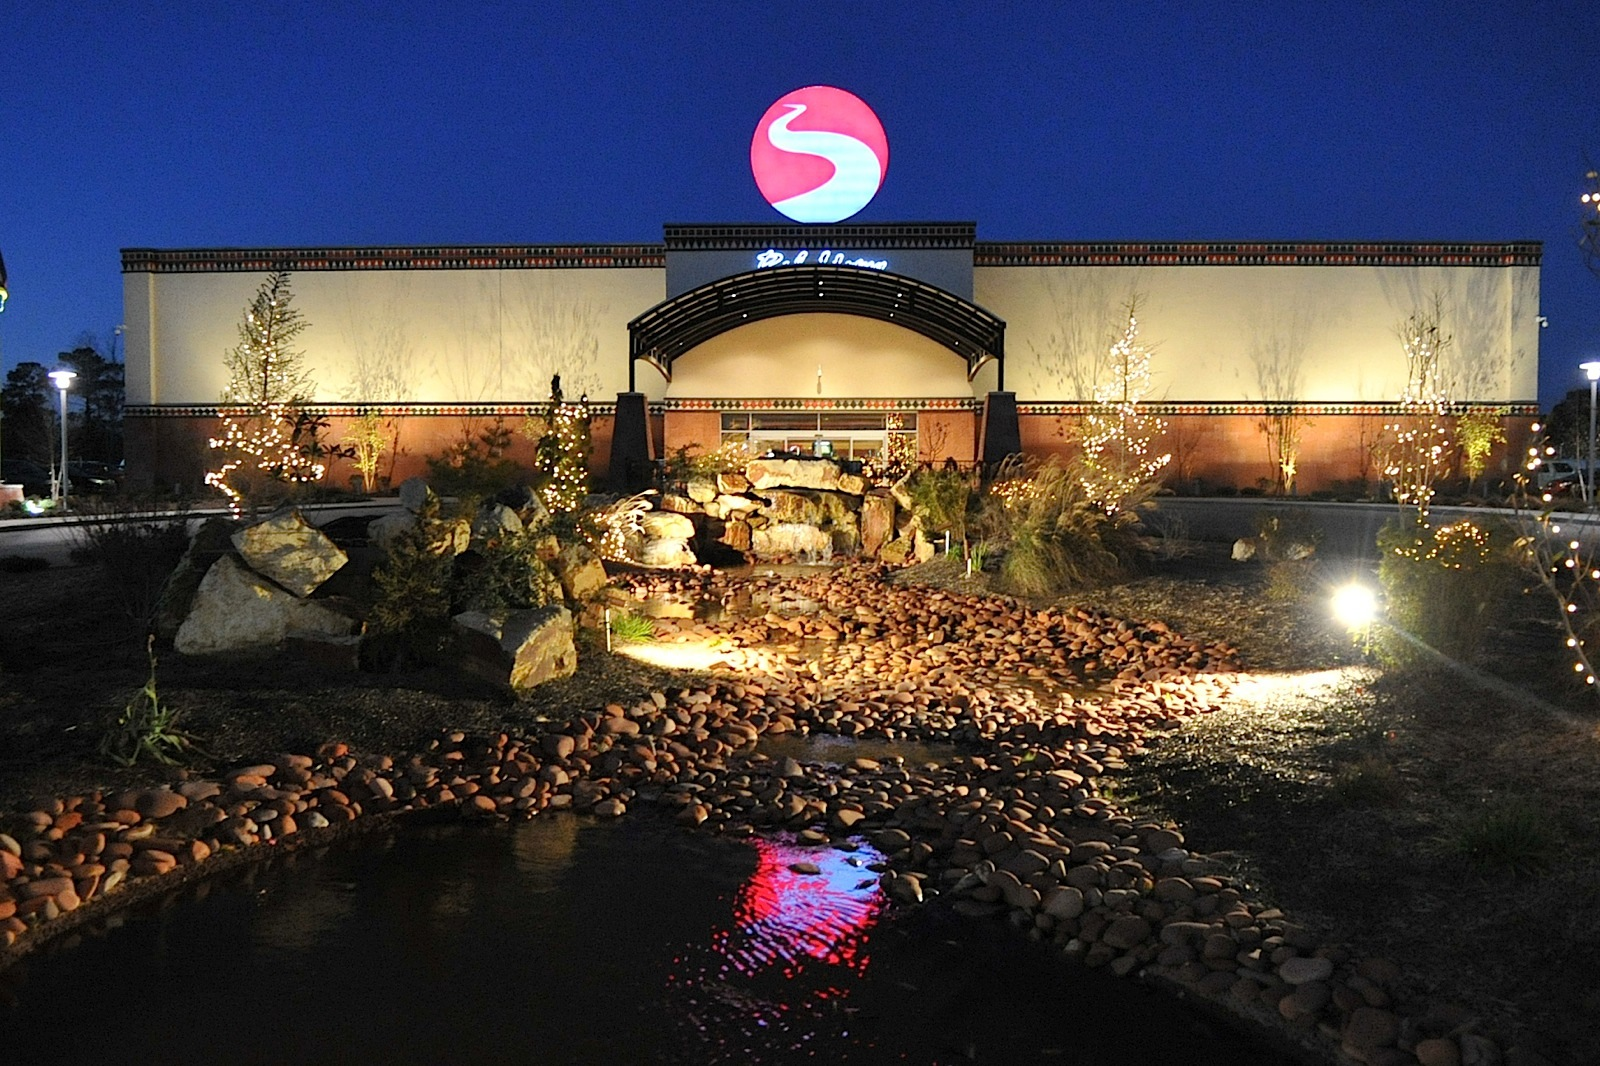 Casino near philidelphia mississippi algarve casino casino casino casinoalgarve online